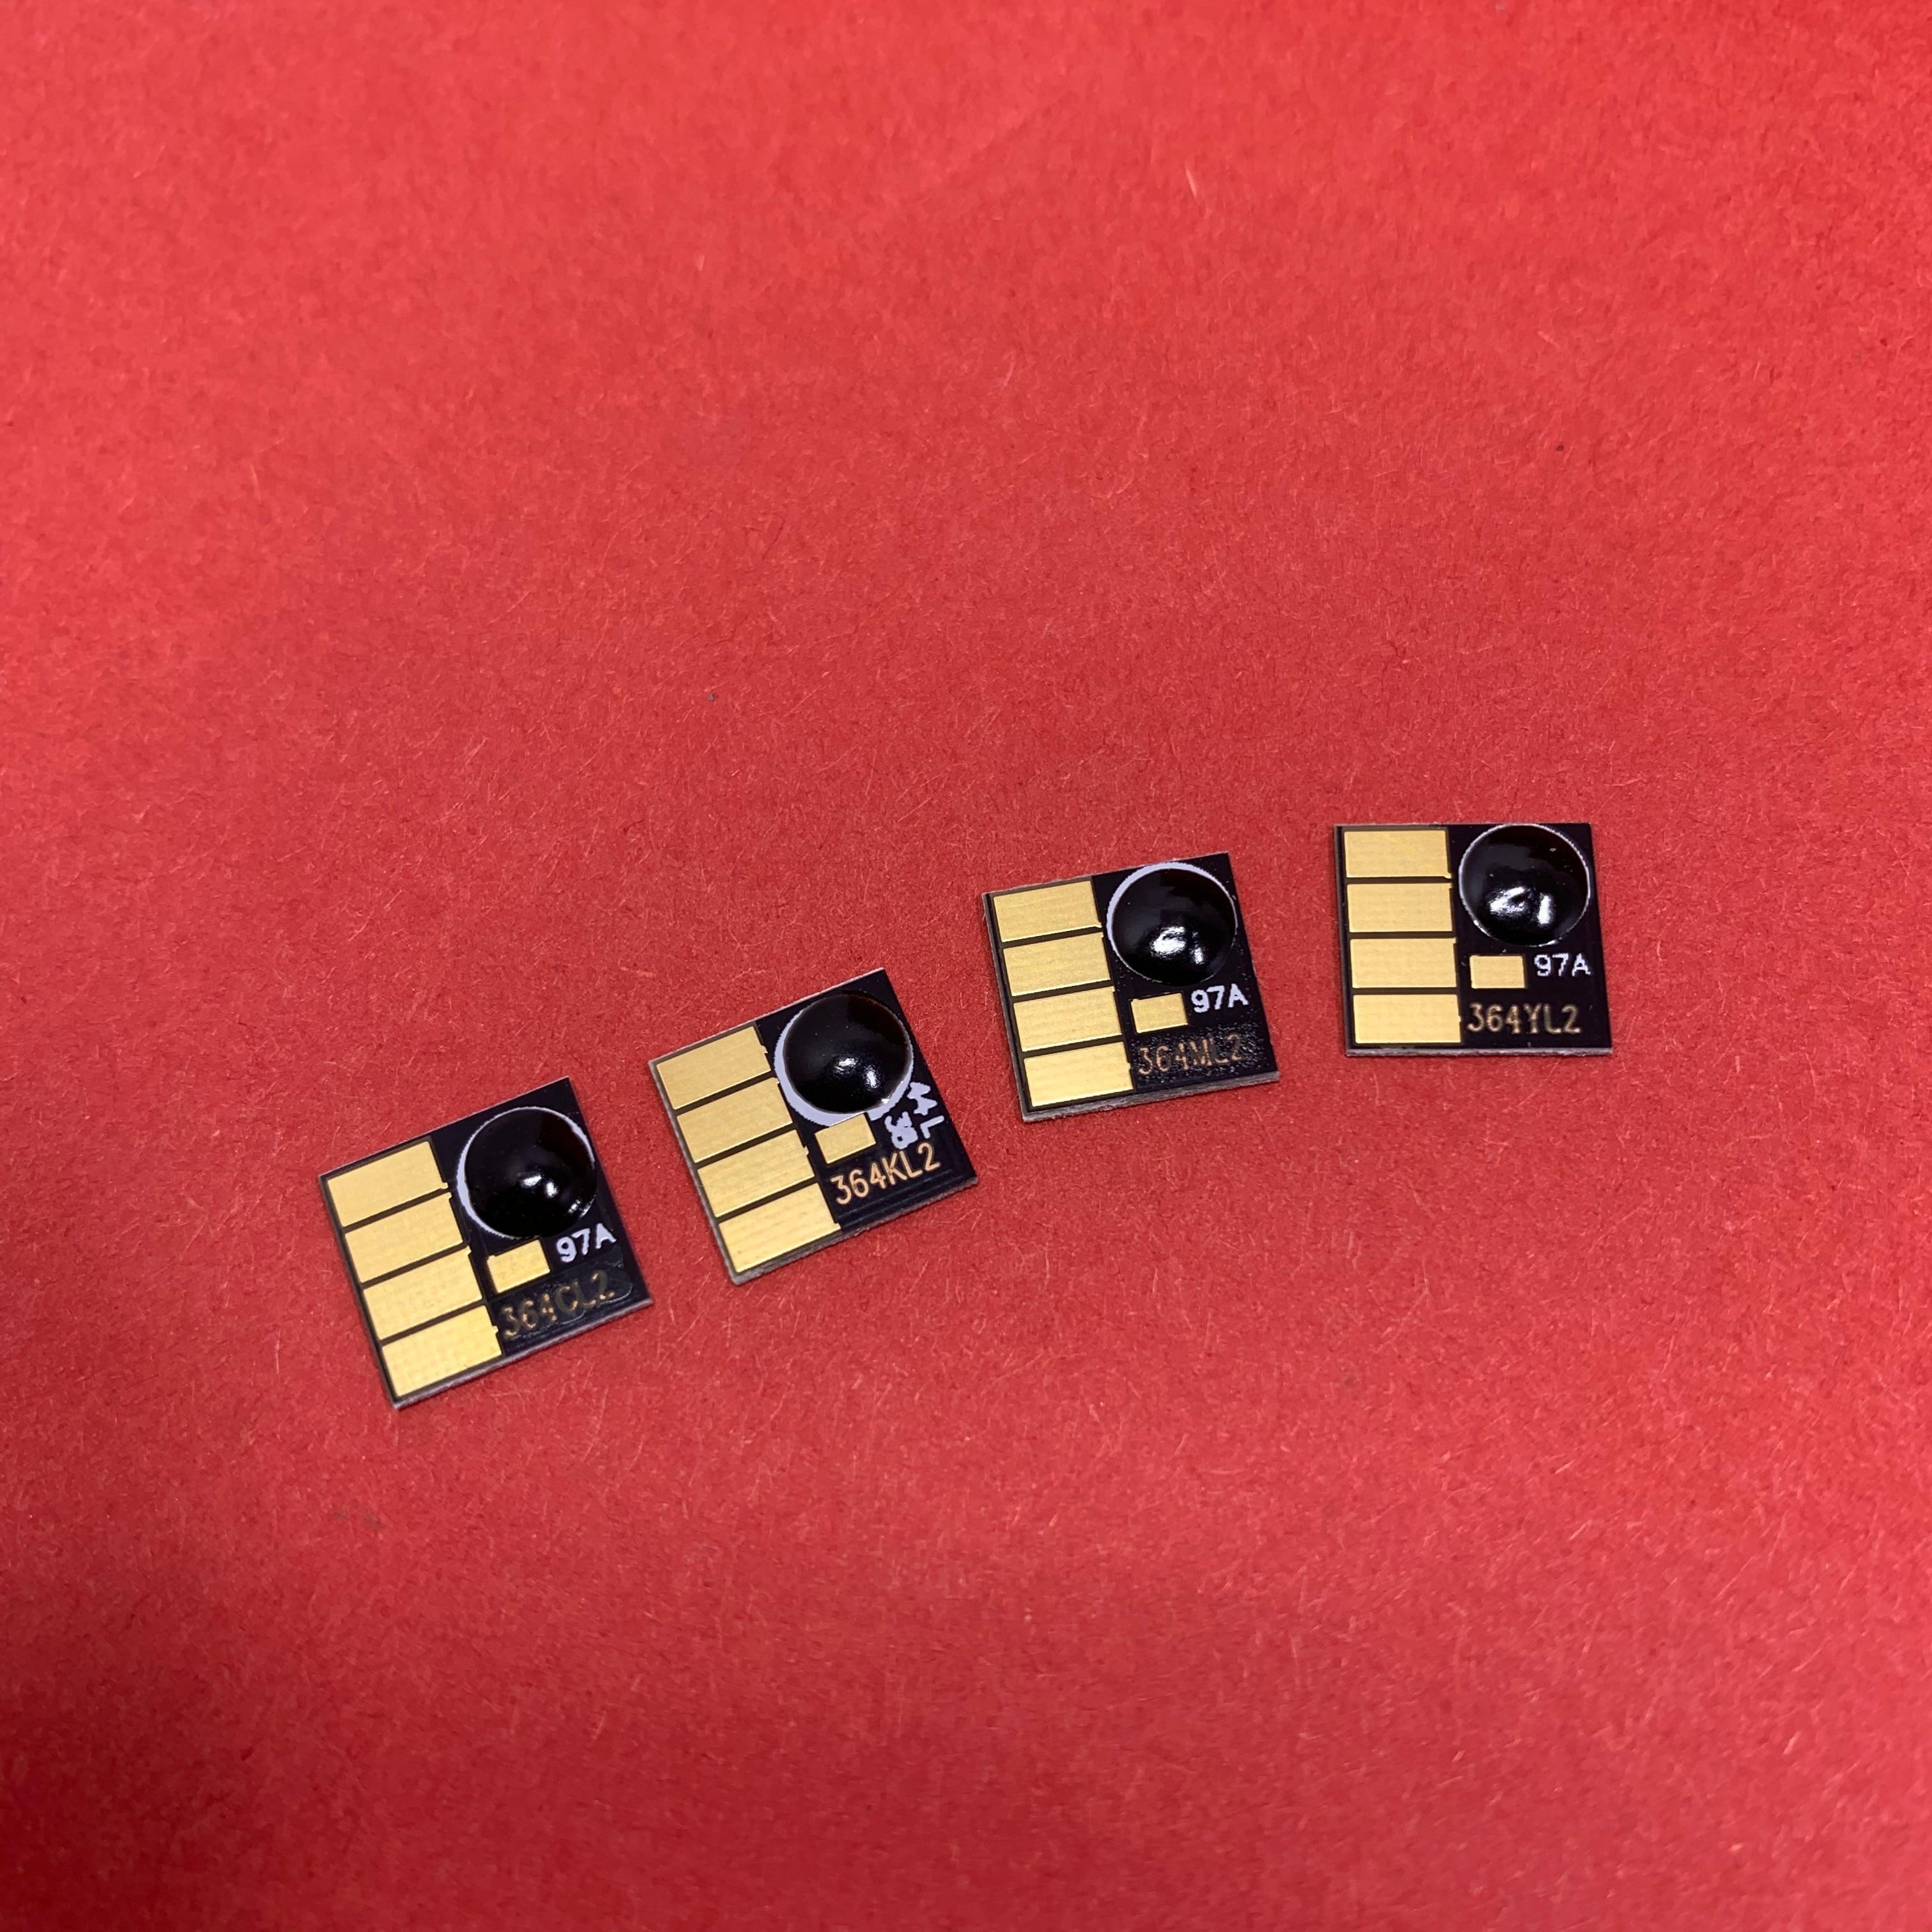 YOTAT 4color permanente chip para HP364XL HP 364XL HP364 HP 364 para HP Photosmart B8550 B8553 B8558 C6380 C6383 C5324 impresora